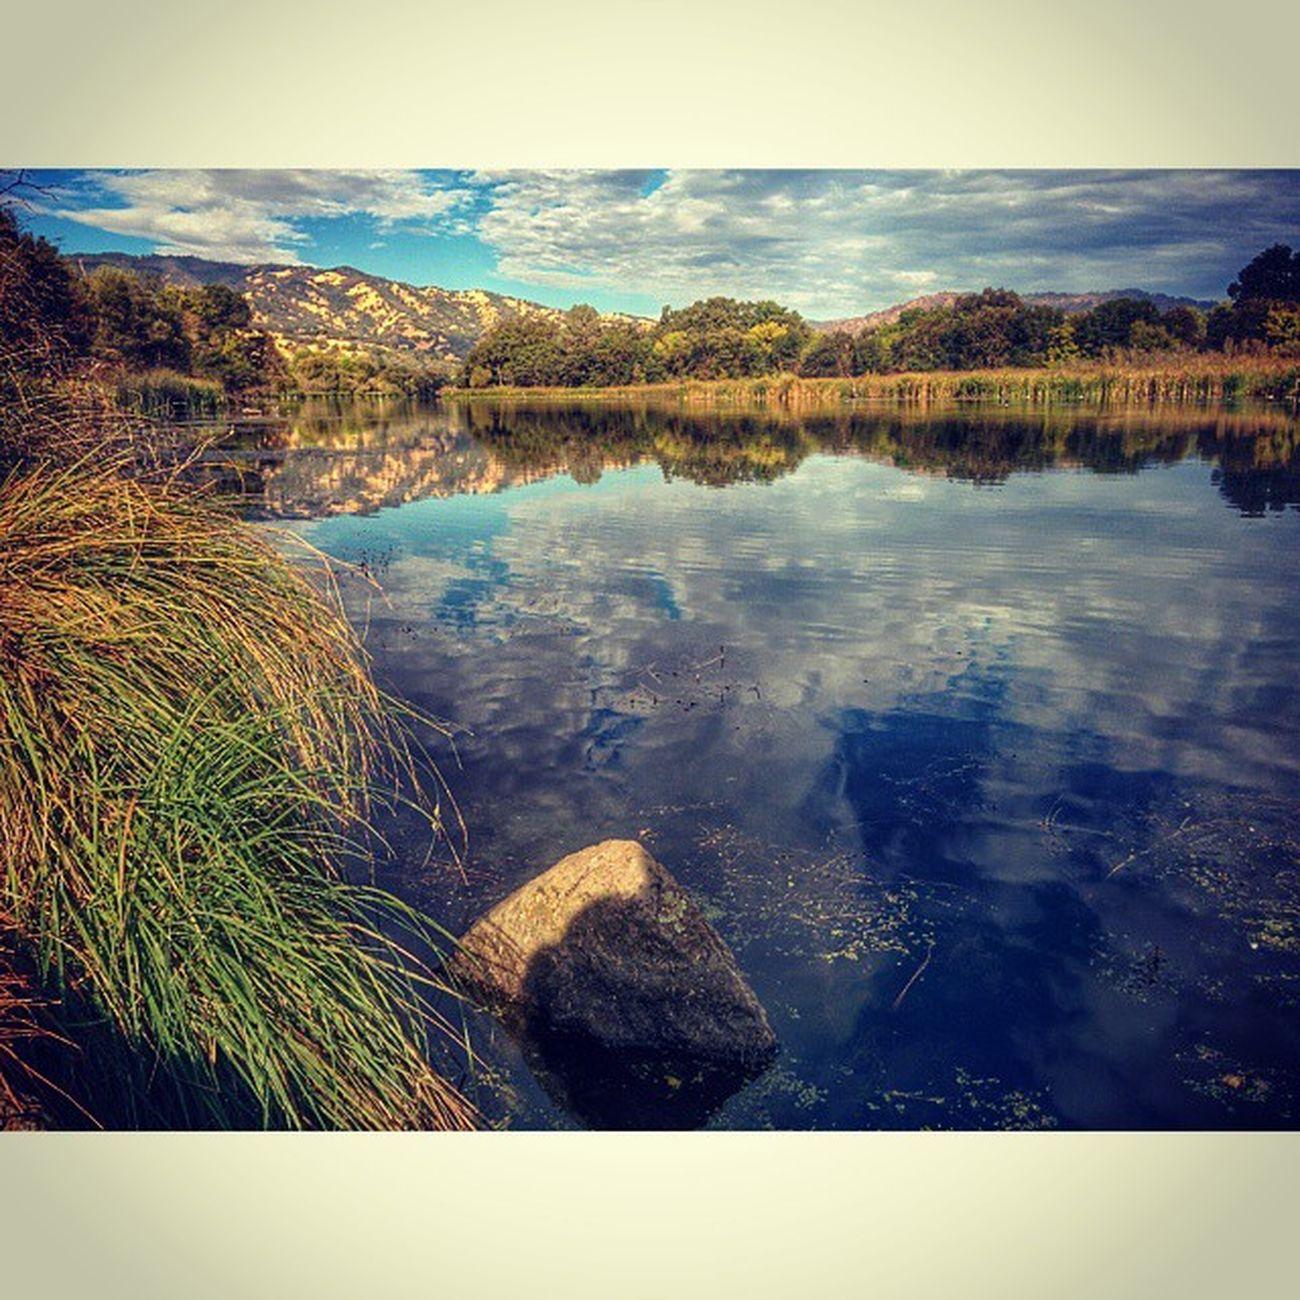 Goodmorning Putahcreek LakeSolano Wintersca Landscape Lake Water Reflection